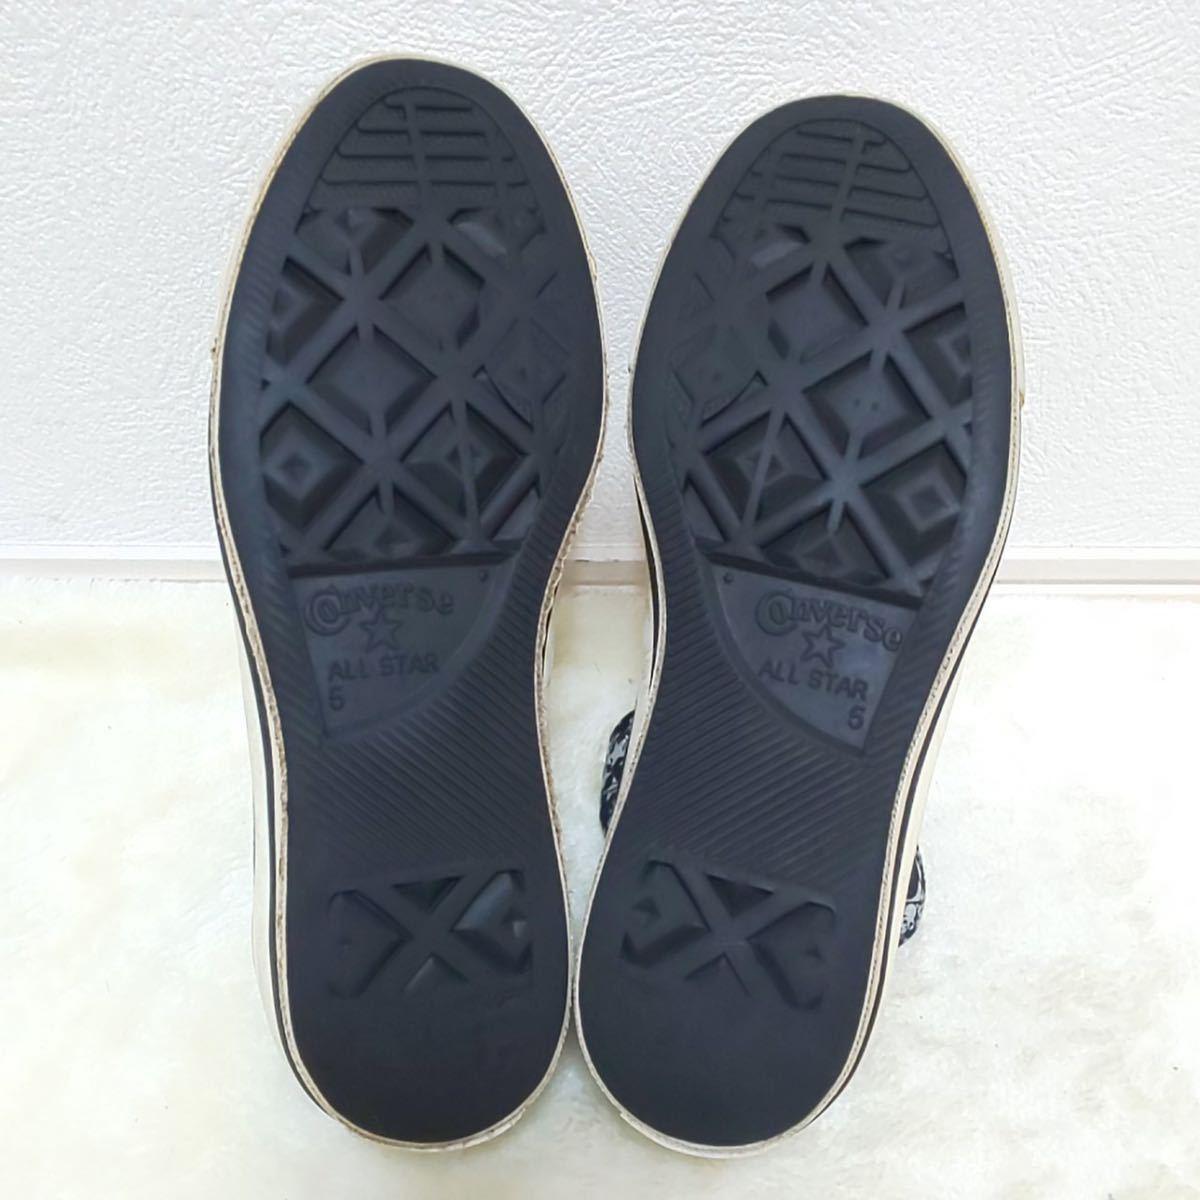 【CONVERSE】コンバースオールスター ALL STAR ハイカットスニーカー キャンバス ドクロ スカル ロック 黒 シルバー 靴 シューズ 24cm/jx_画像7